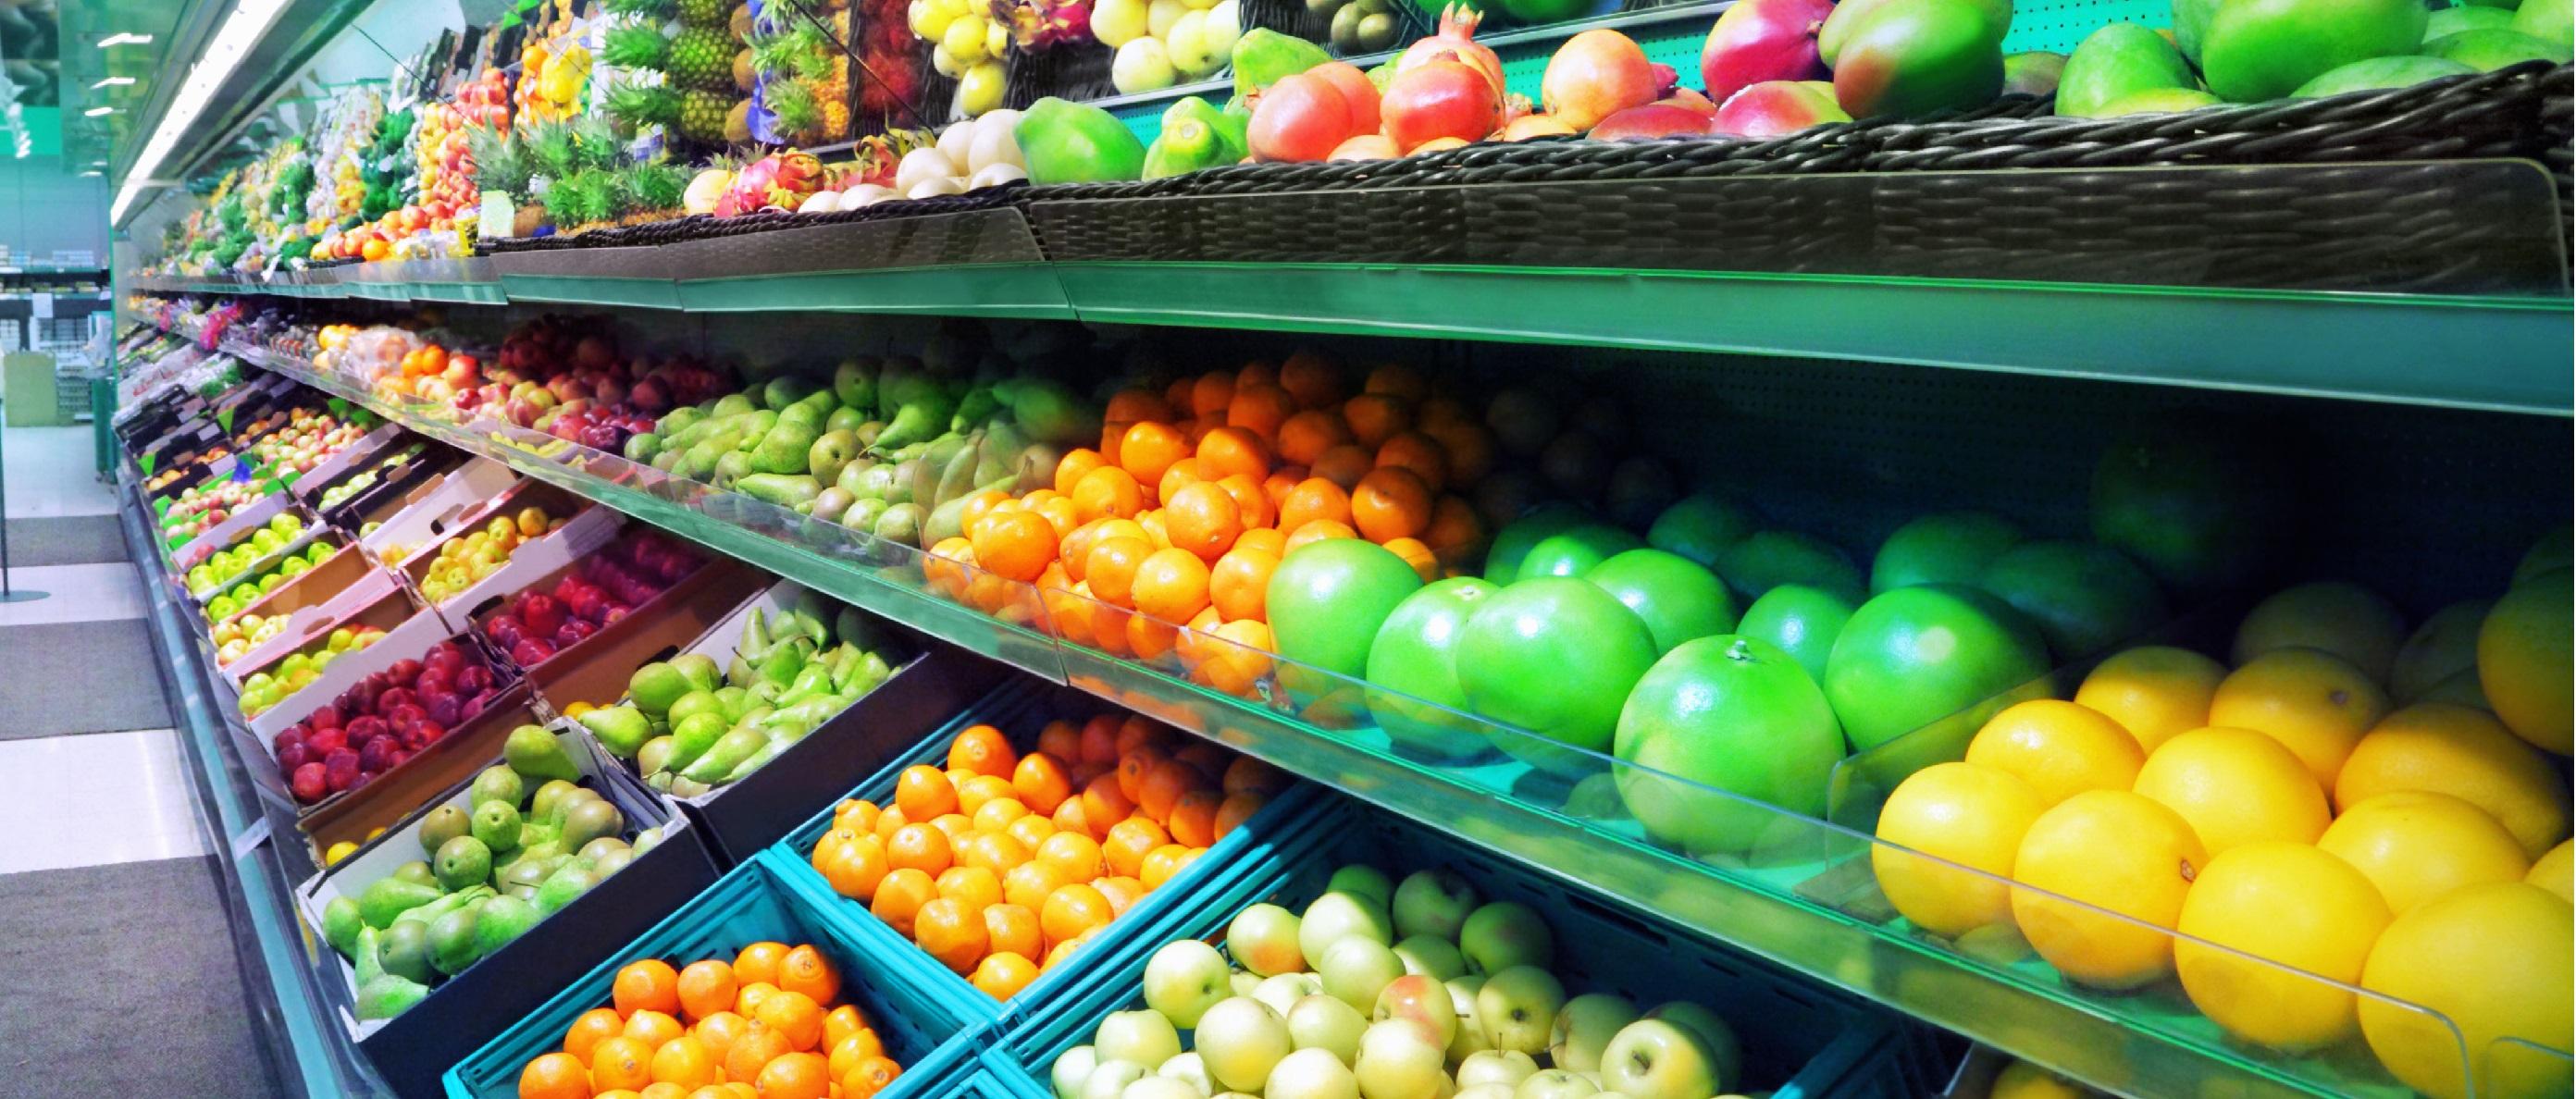 Food, Retailers & Manufacturers